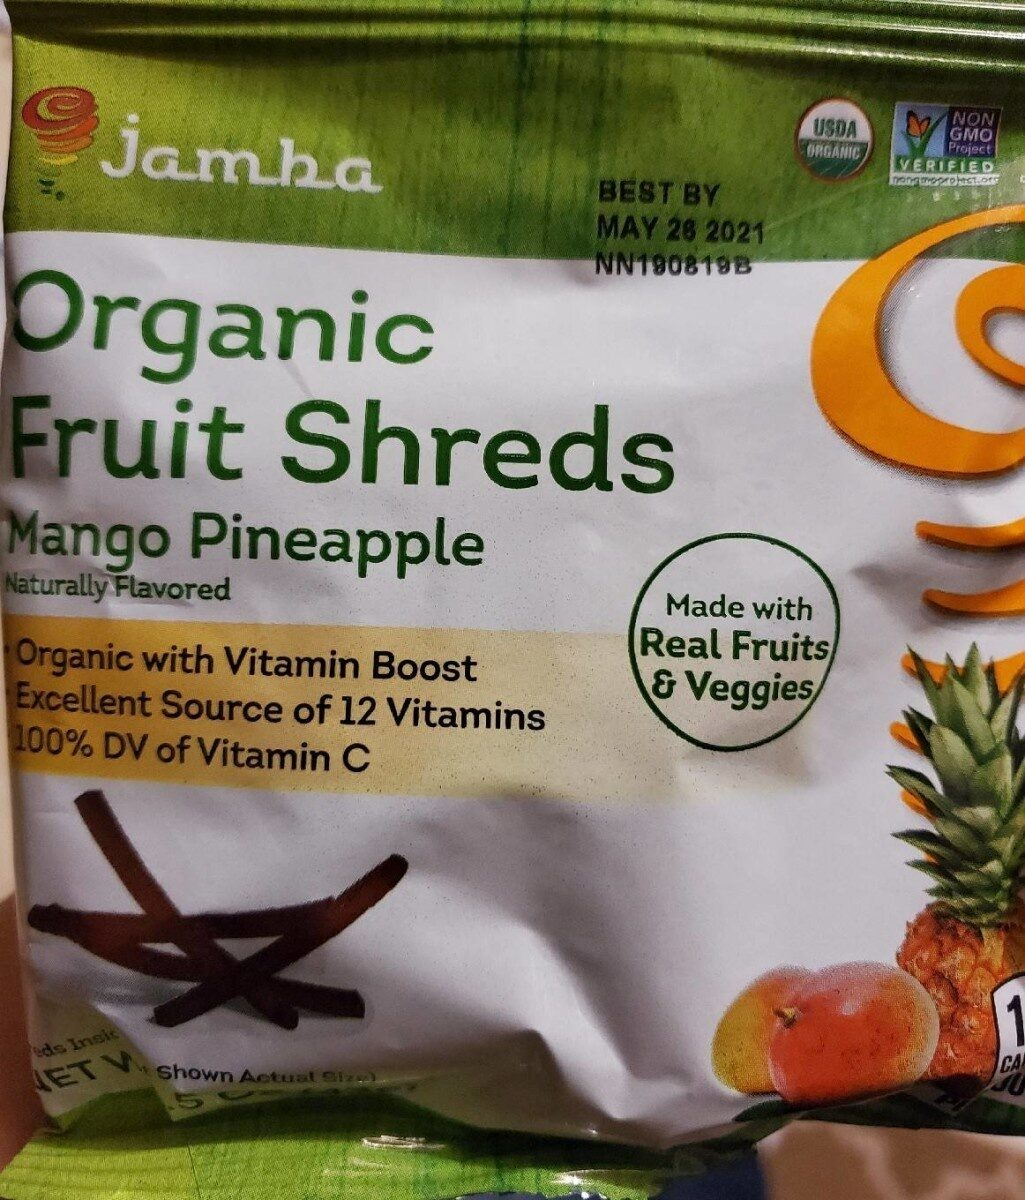 Mango pineapple organic fruit shreds - Product - en